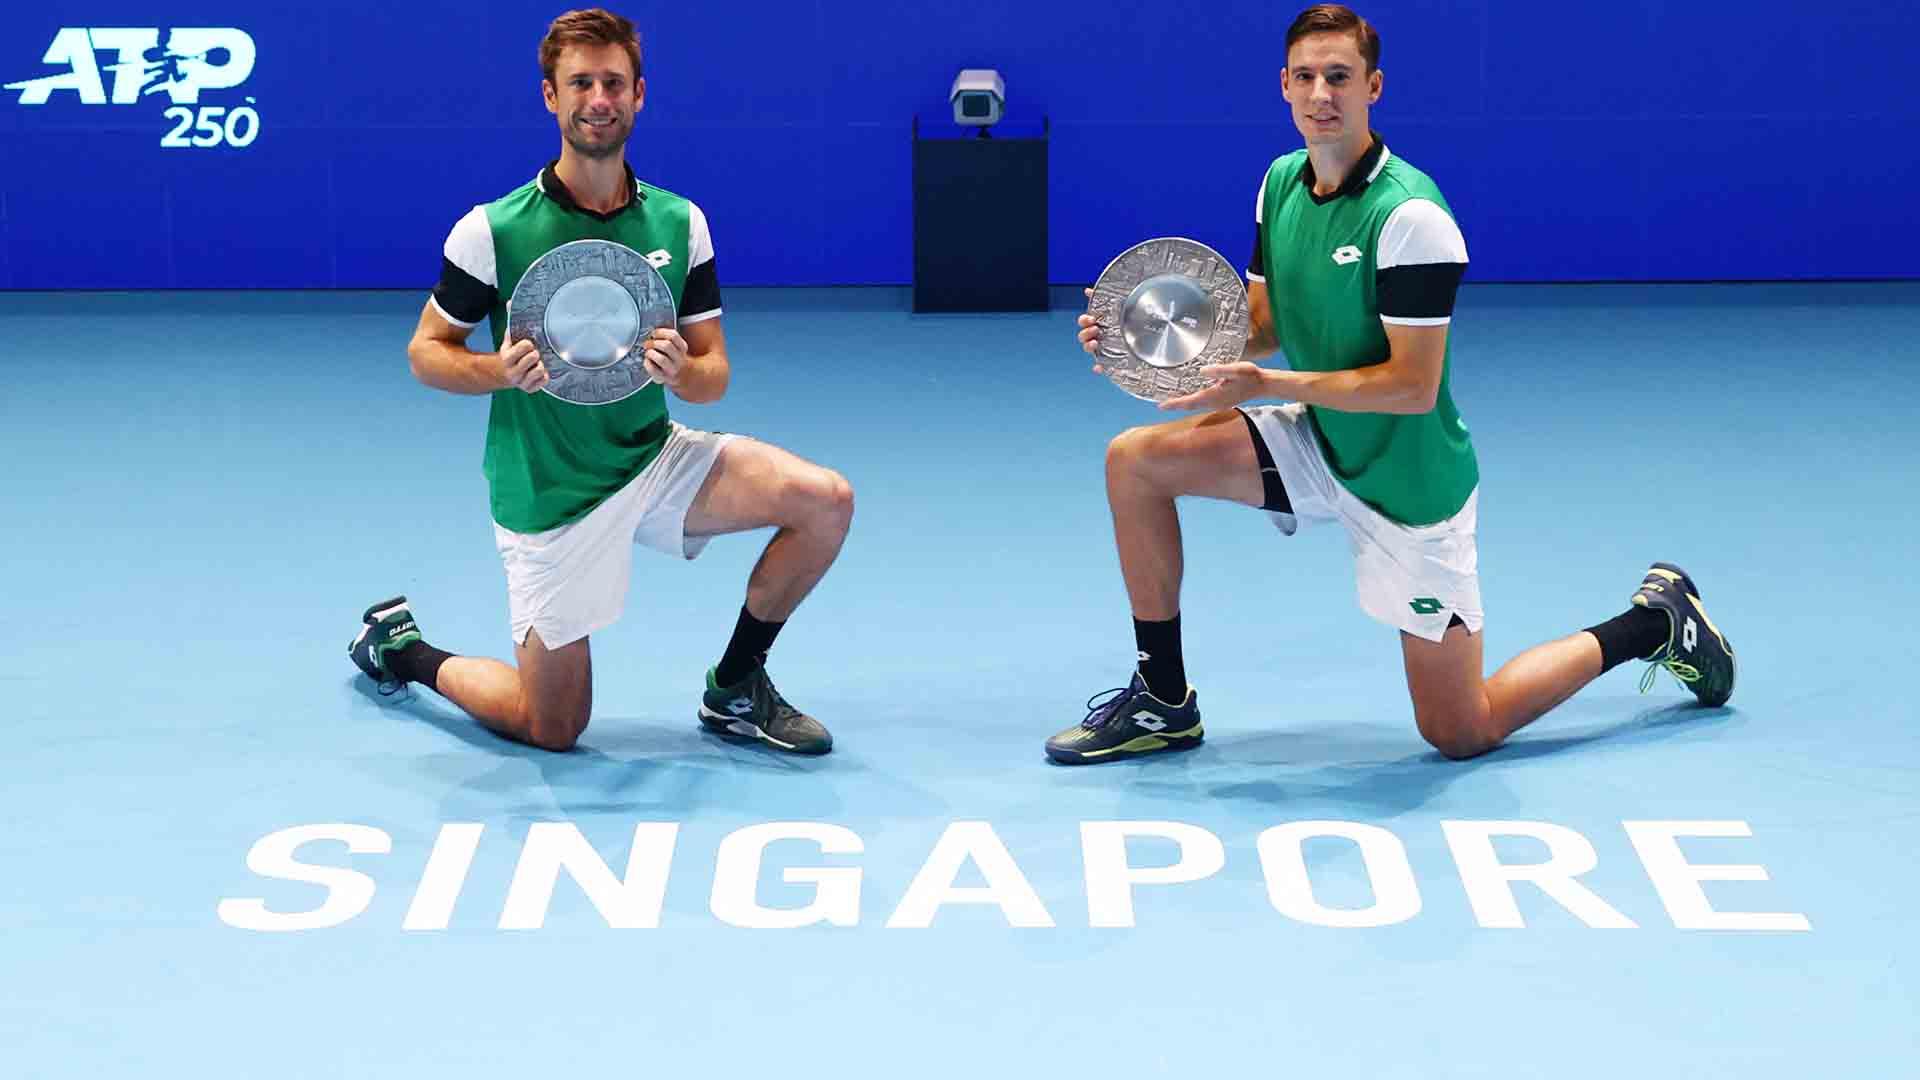 Sander Gille and Joran Vliegen own a 5-0 record in ATP Tour finals.